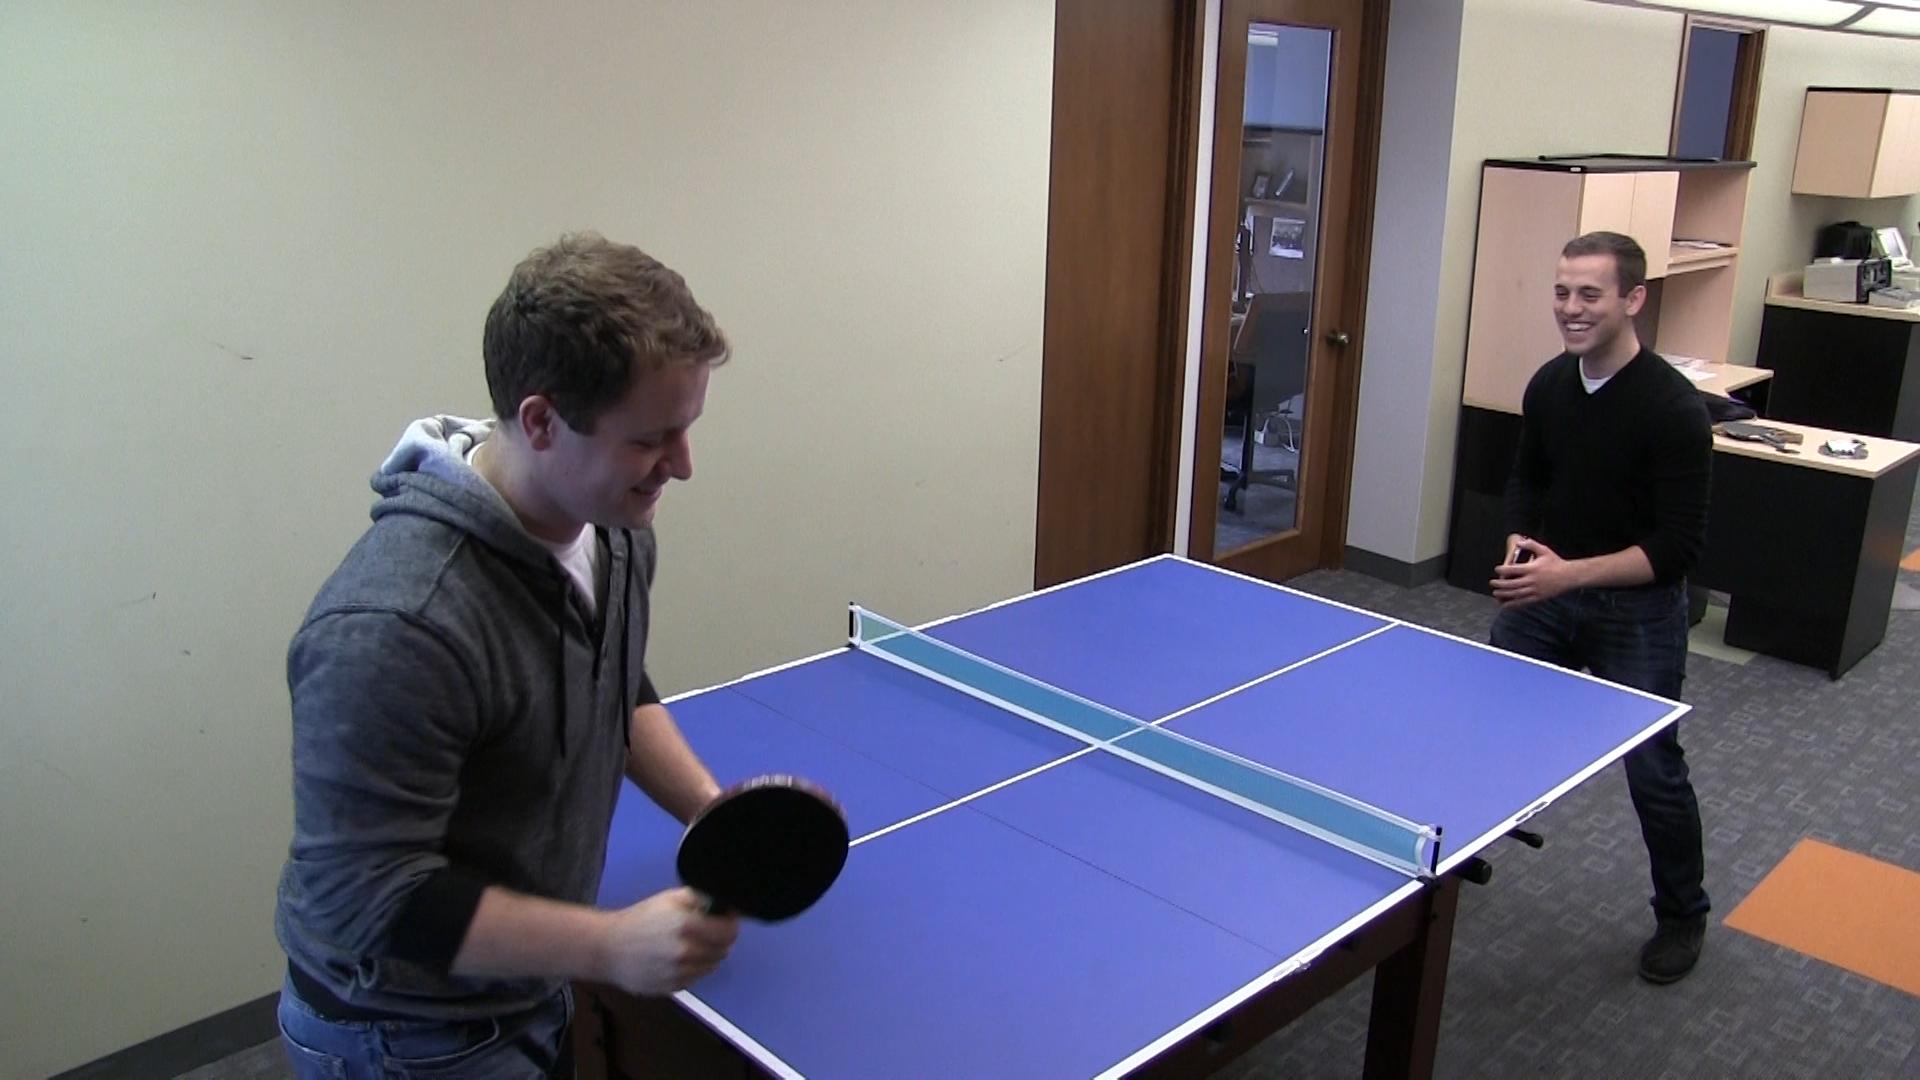 Ping Pong Corey and Matt 3.png